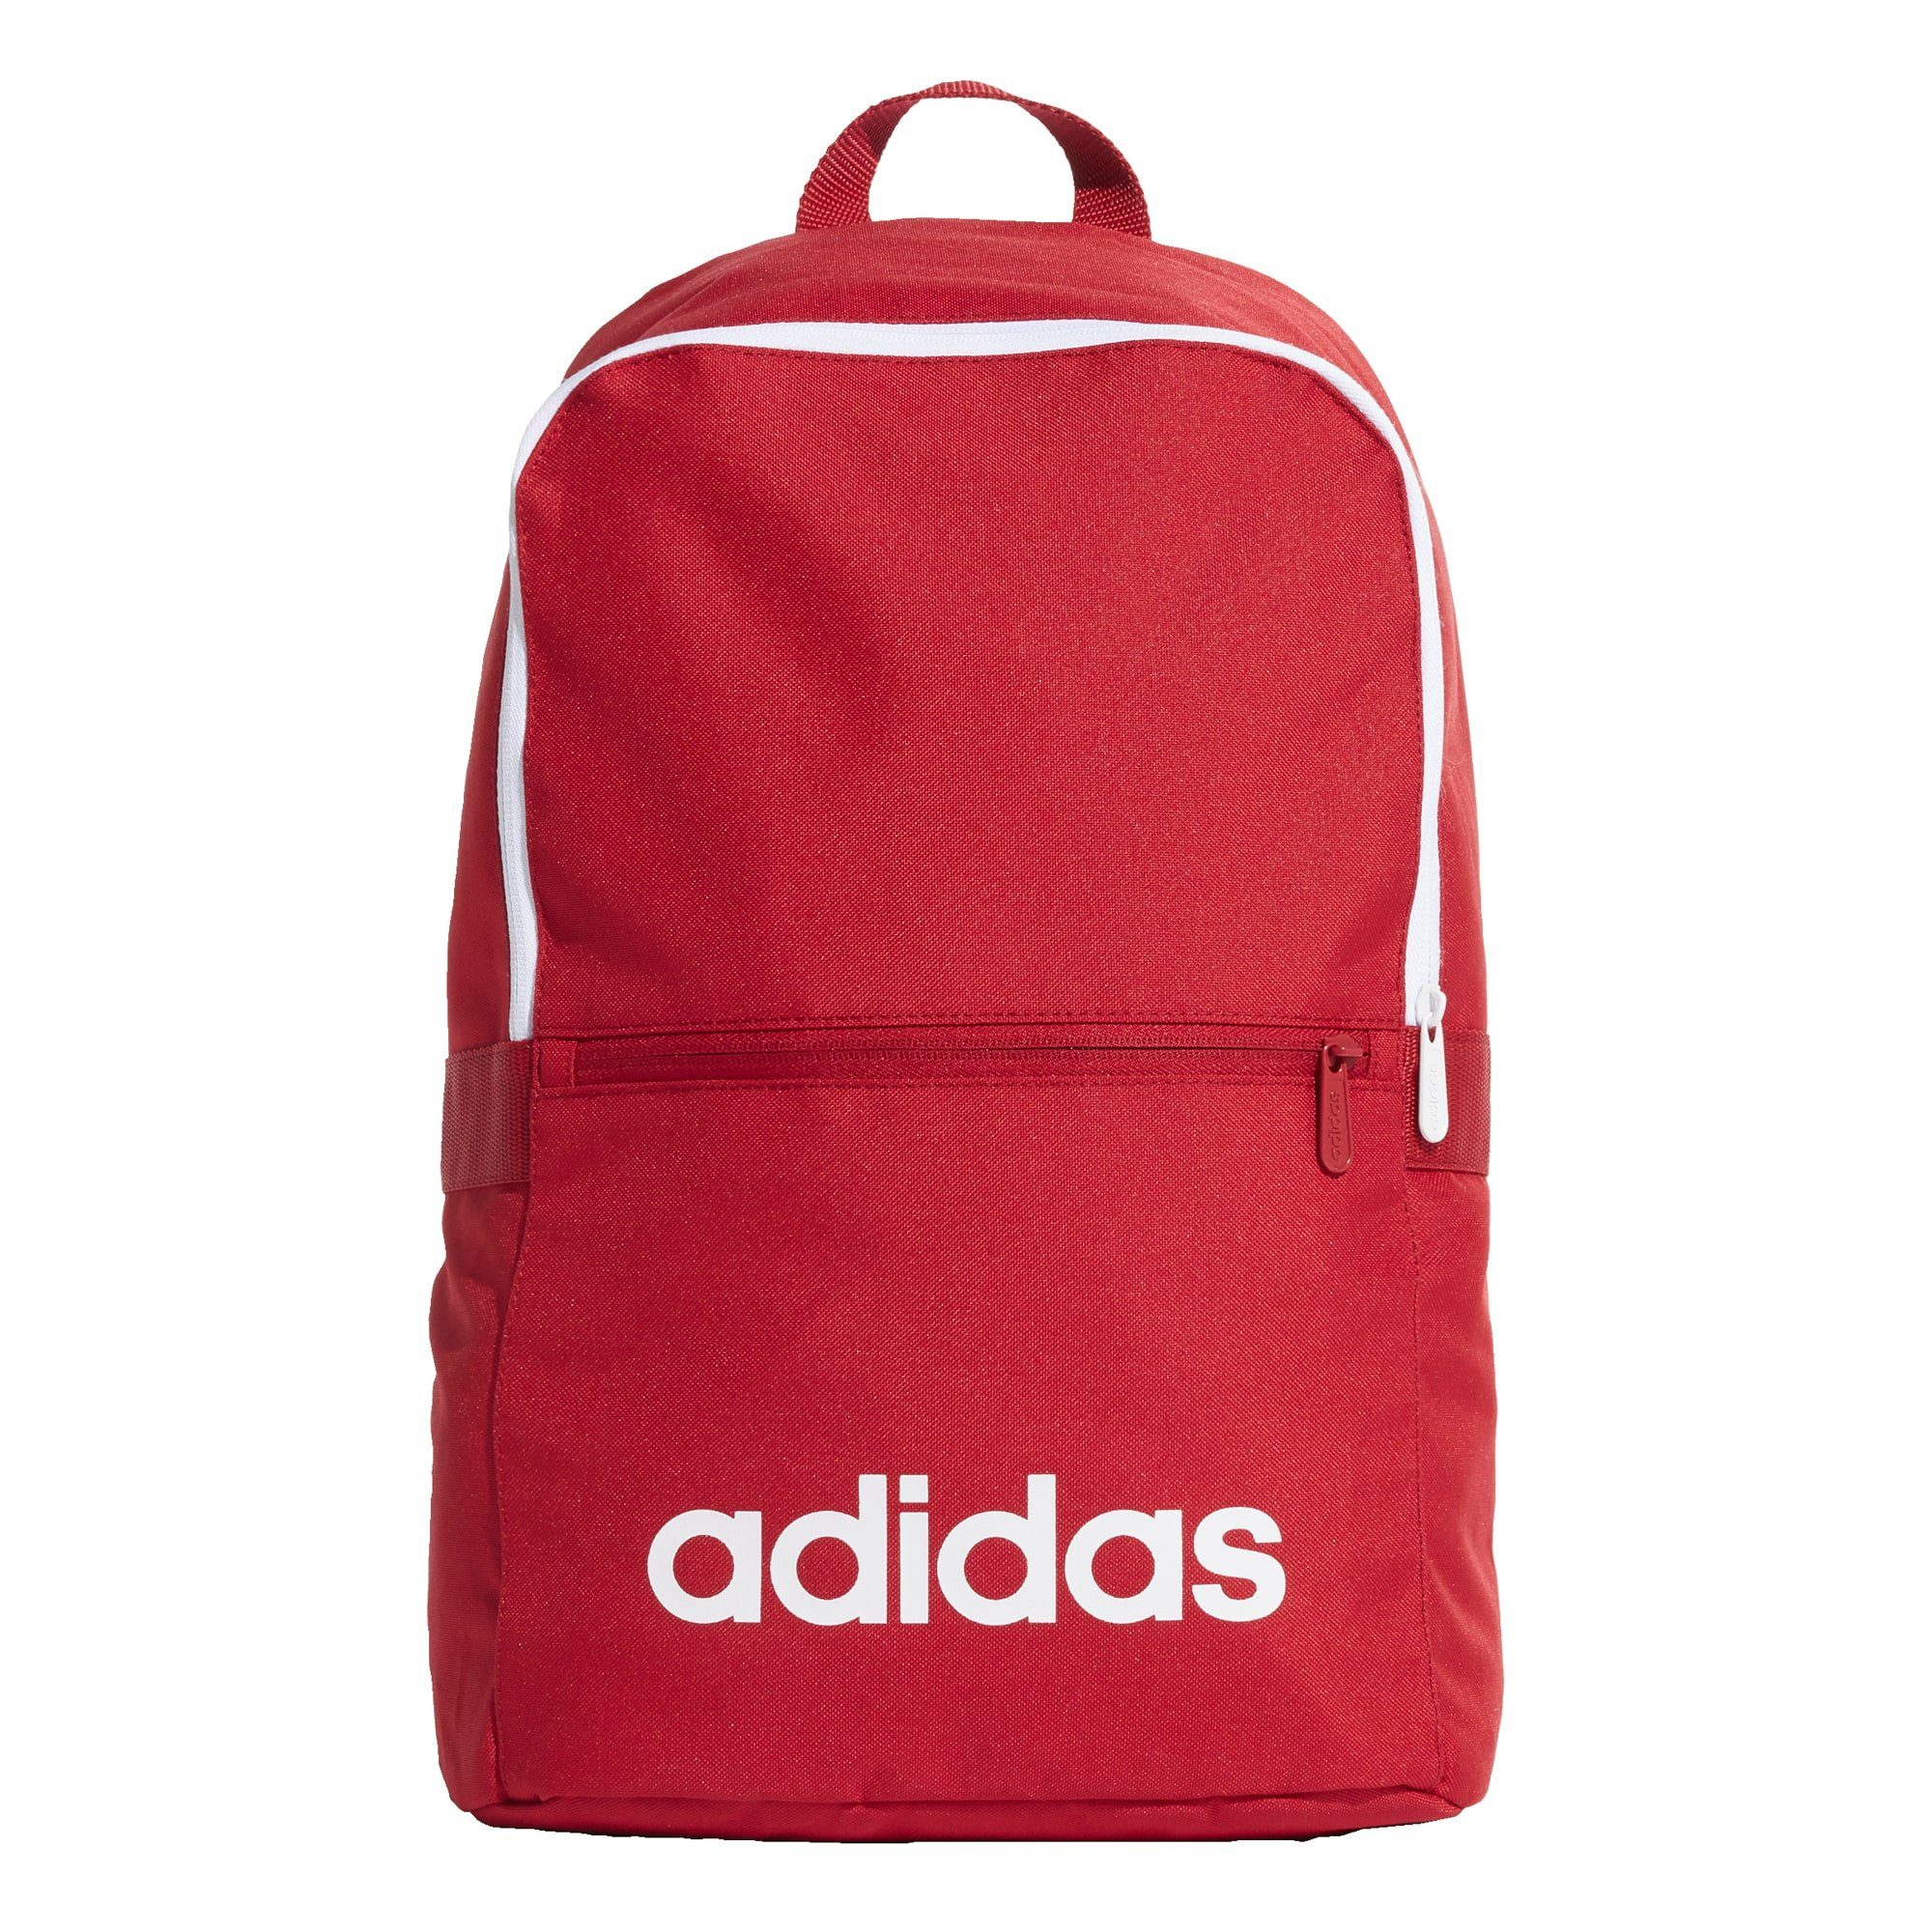 adidas Performance Daypack »Linear Classic Daily Rucksack«, Essentials online kaufen | OTTO